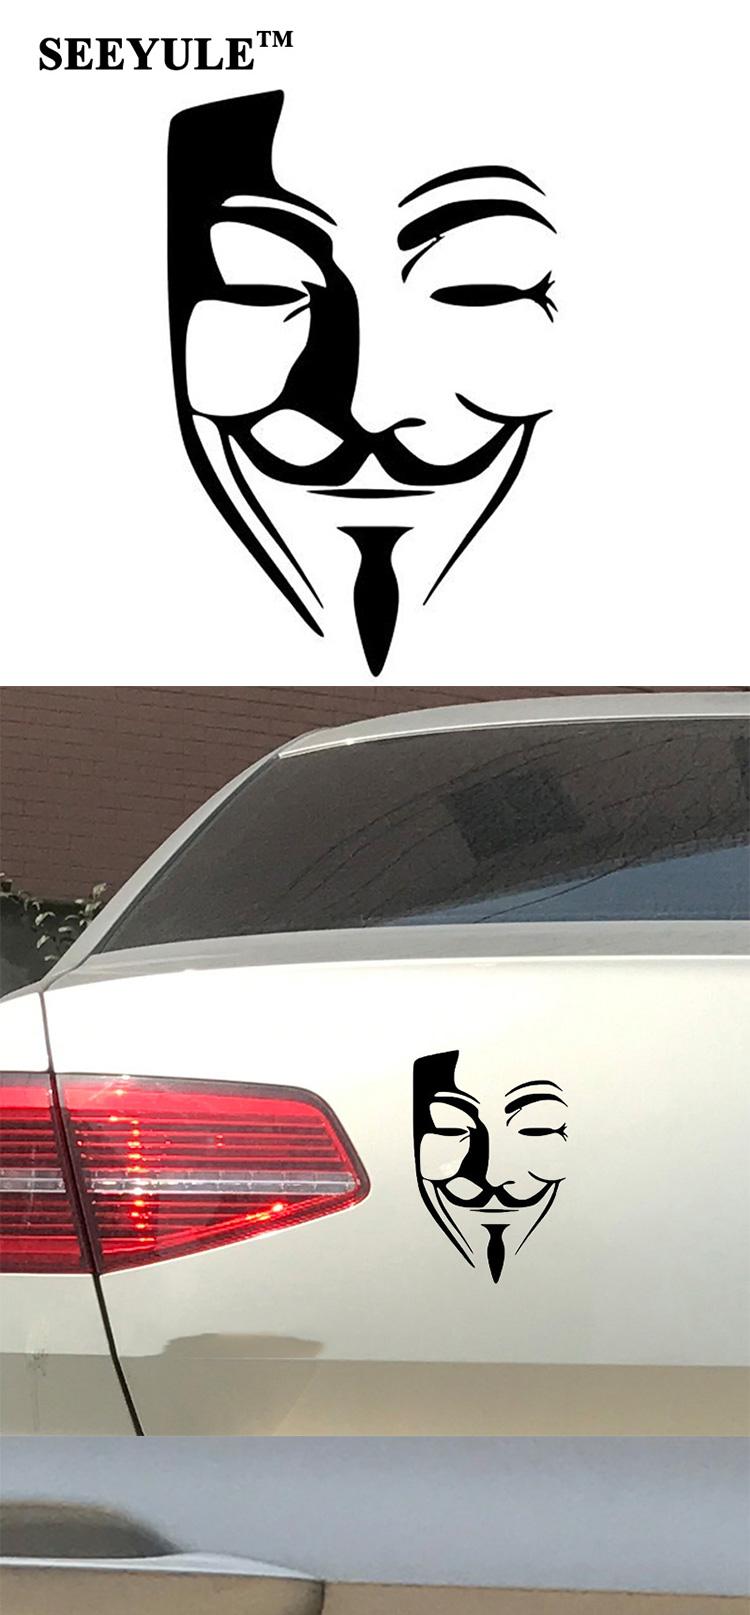 1pc Seeyule Reflective Car Sticker Anonymous Mask Sexy Man V For Vendetta Car Window Bumper Styling Decoration For Bmw Audi Car Sticker Reflective Car Stickerfor Bmw Aliexpress Anonymous mask guy white car road